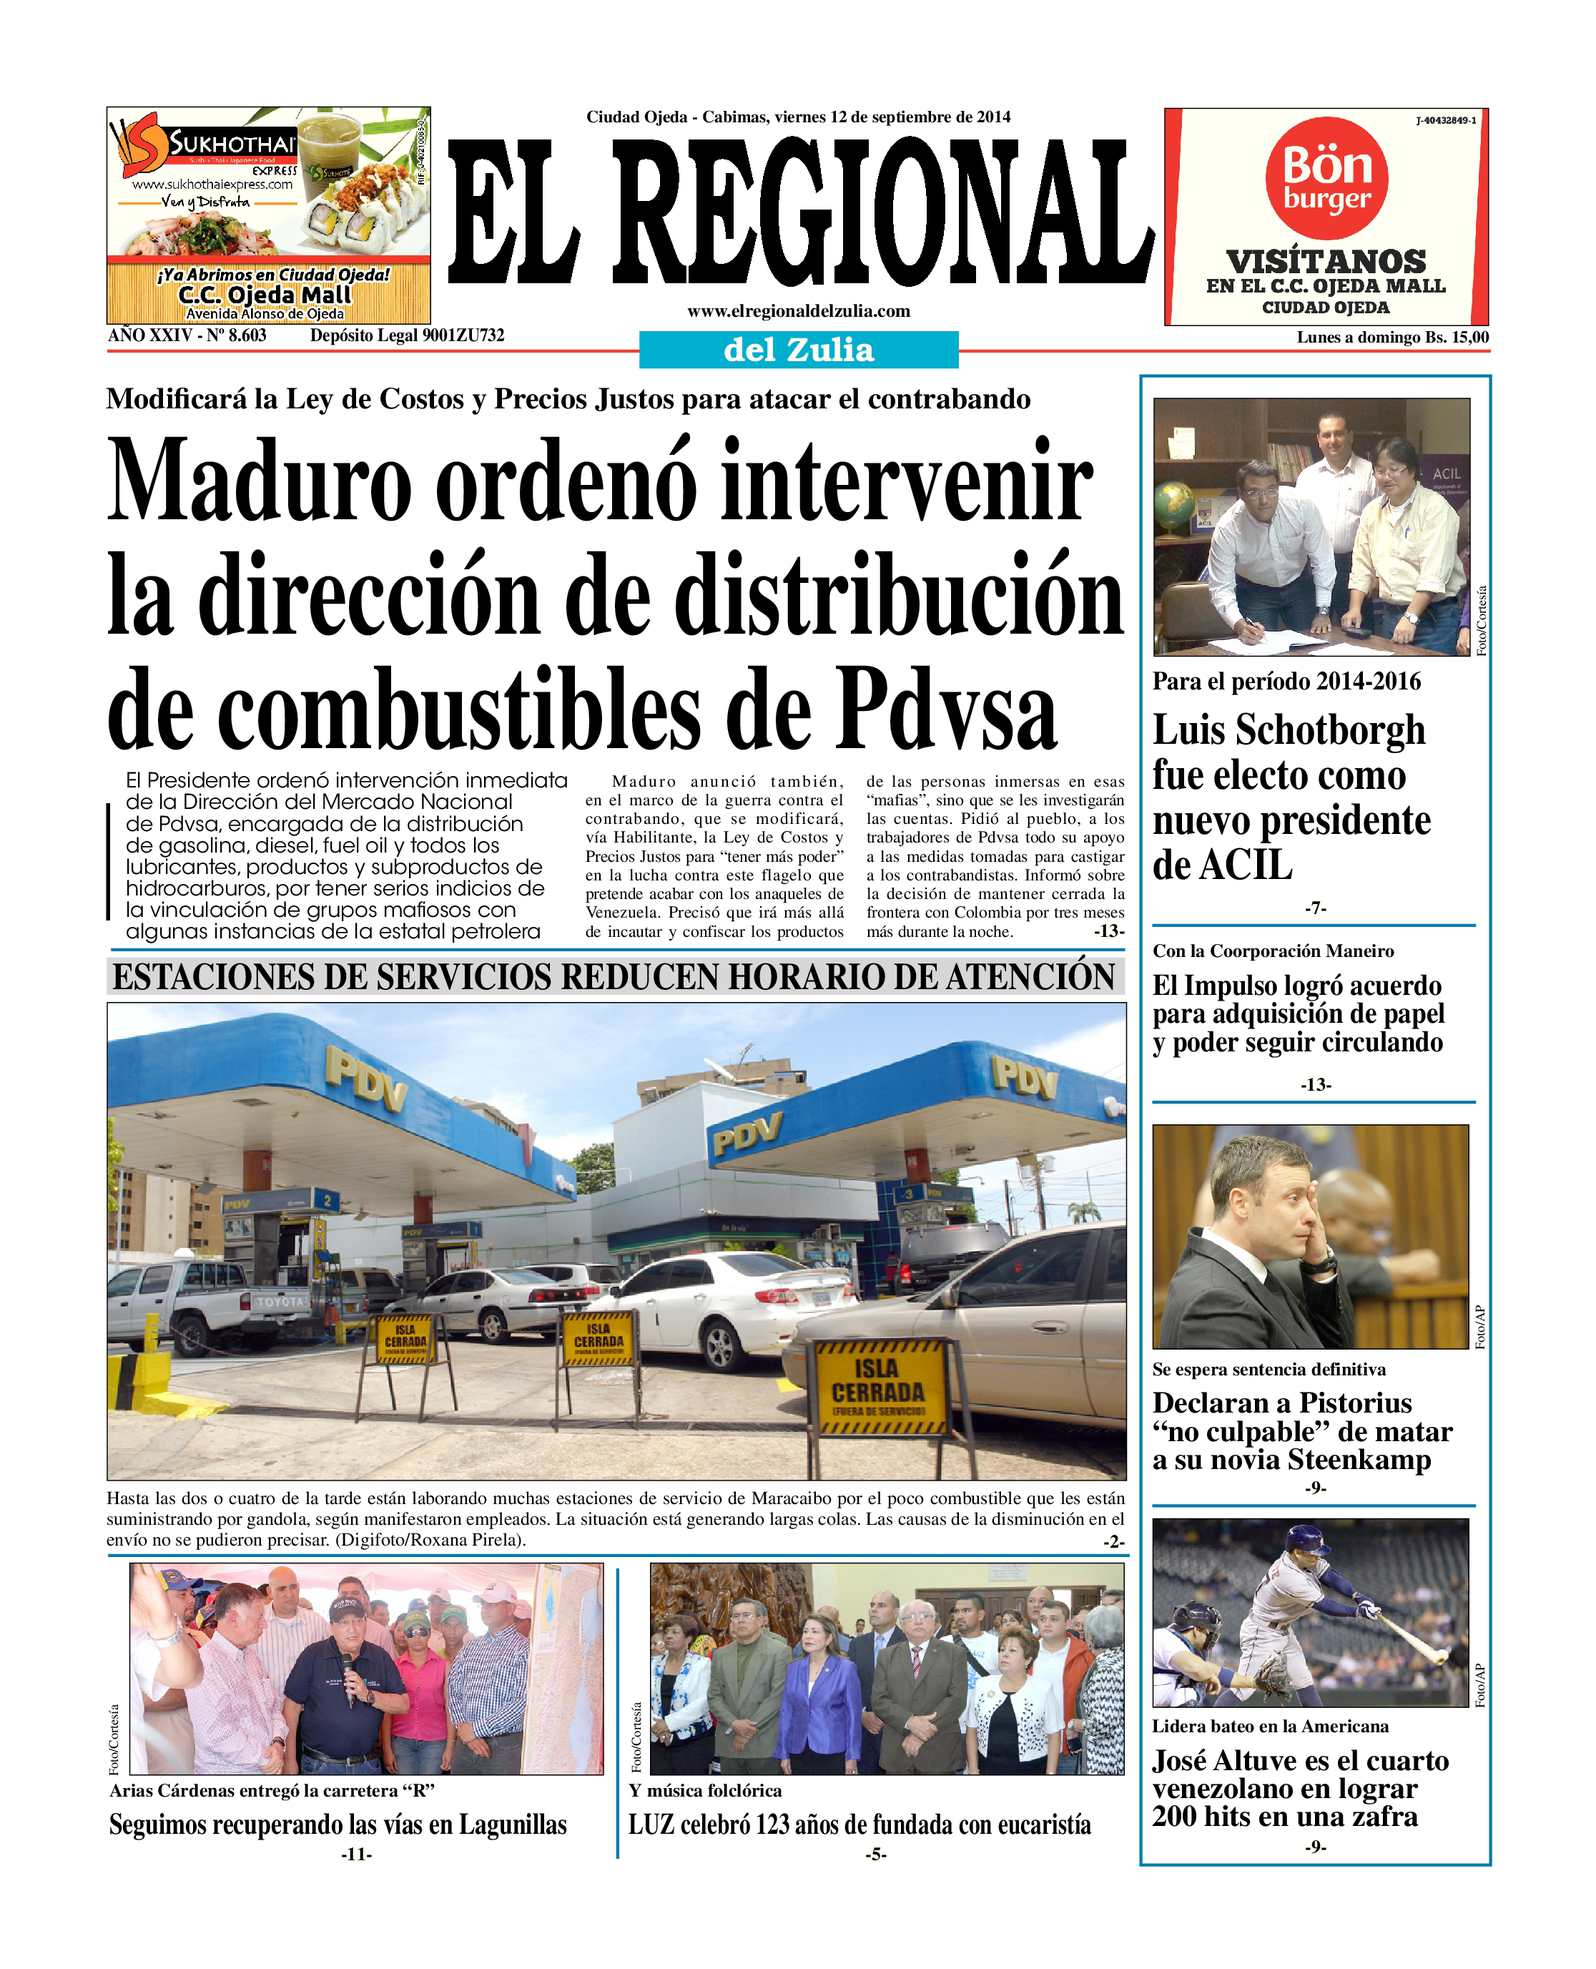 Calaméo - El Regional del Zulia 12-09-2014